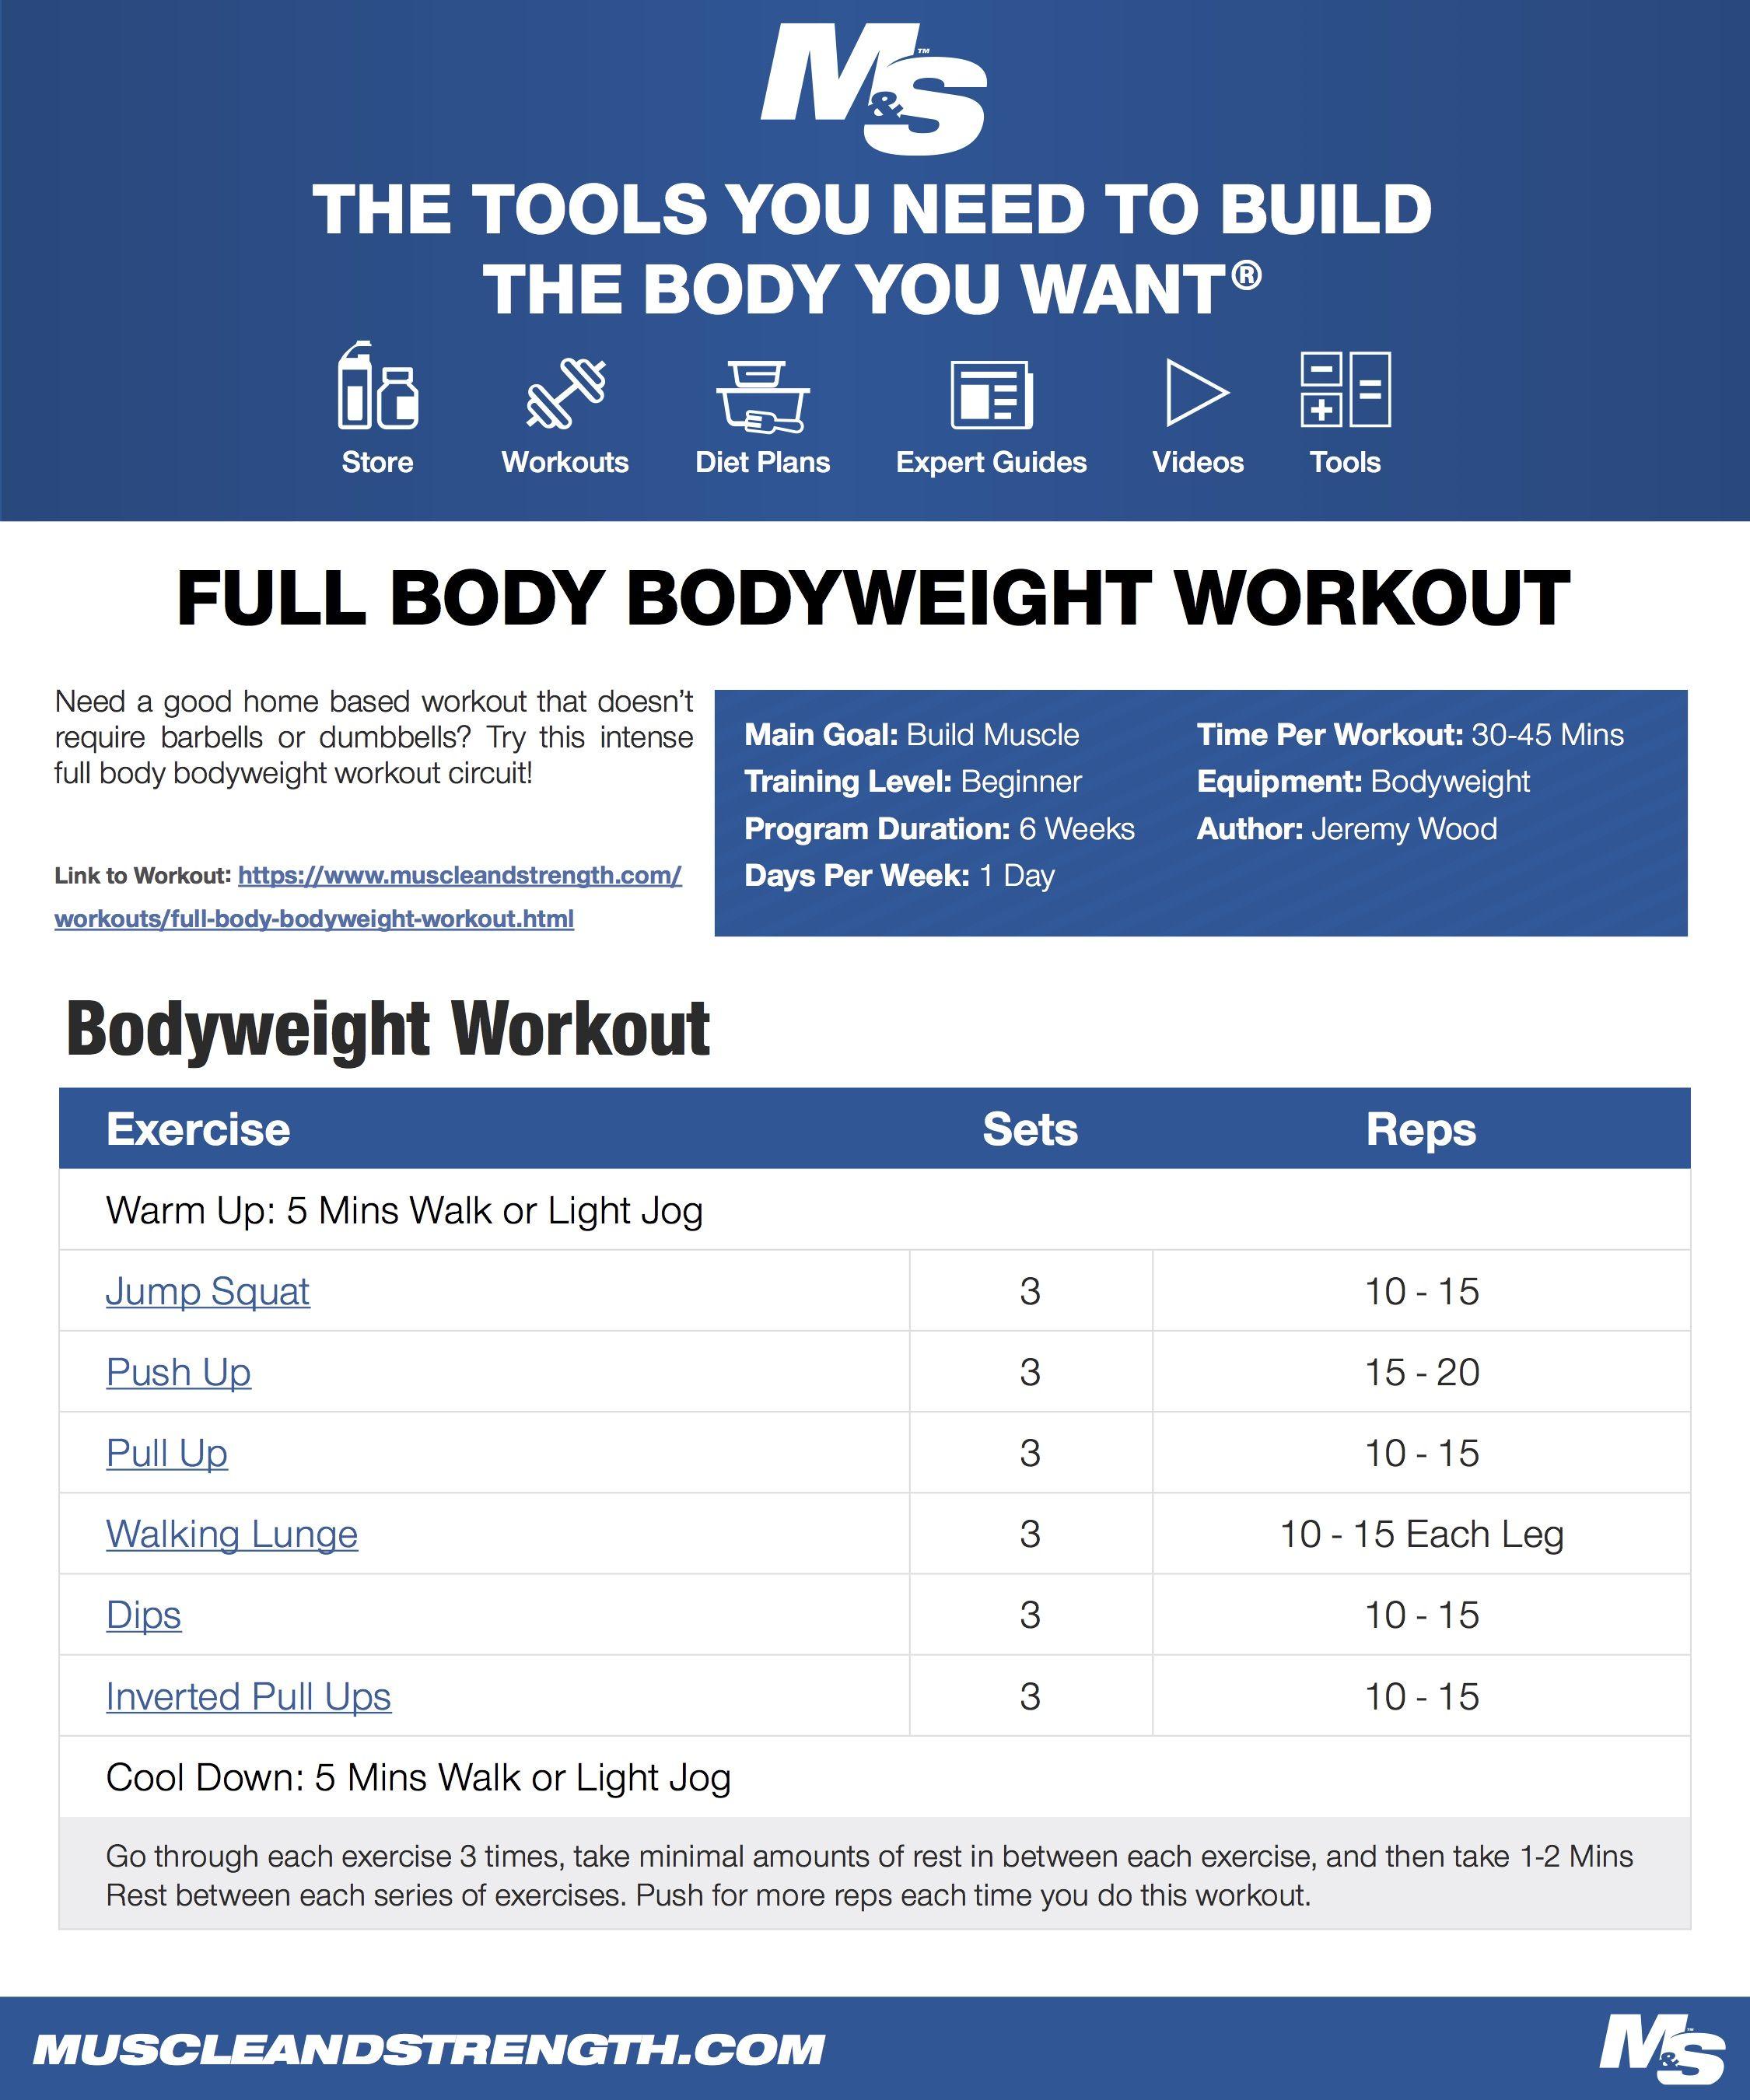 Full Body Bodyweight Workout Full Body Bodyweight Workout Bodyweight Workout Full Body Weight Workout